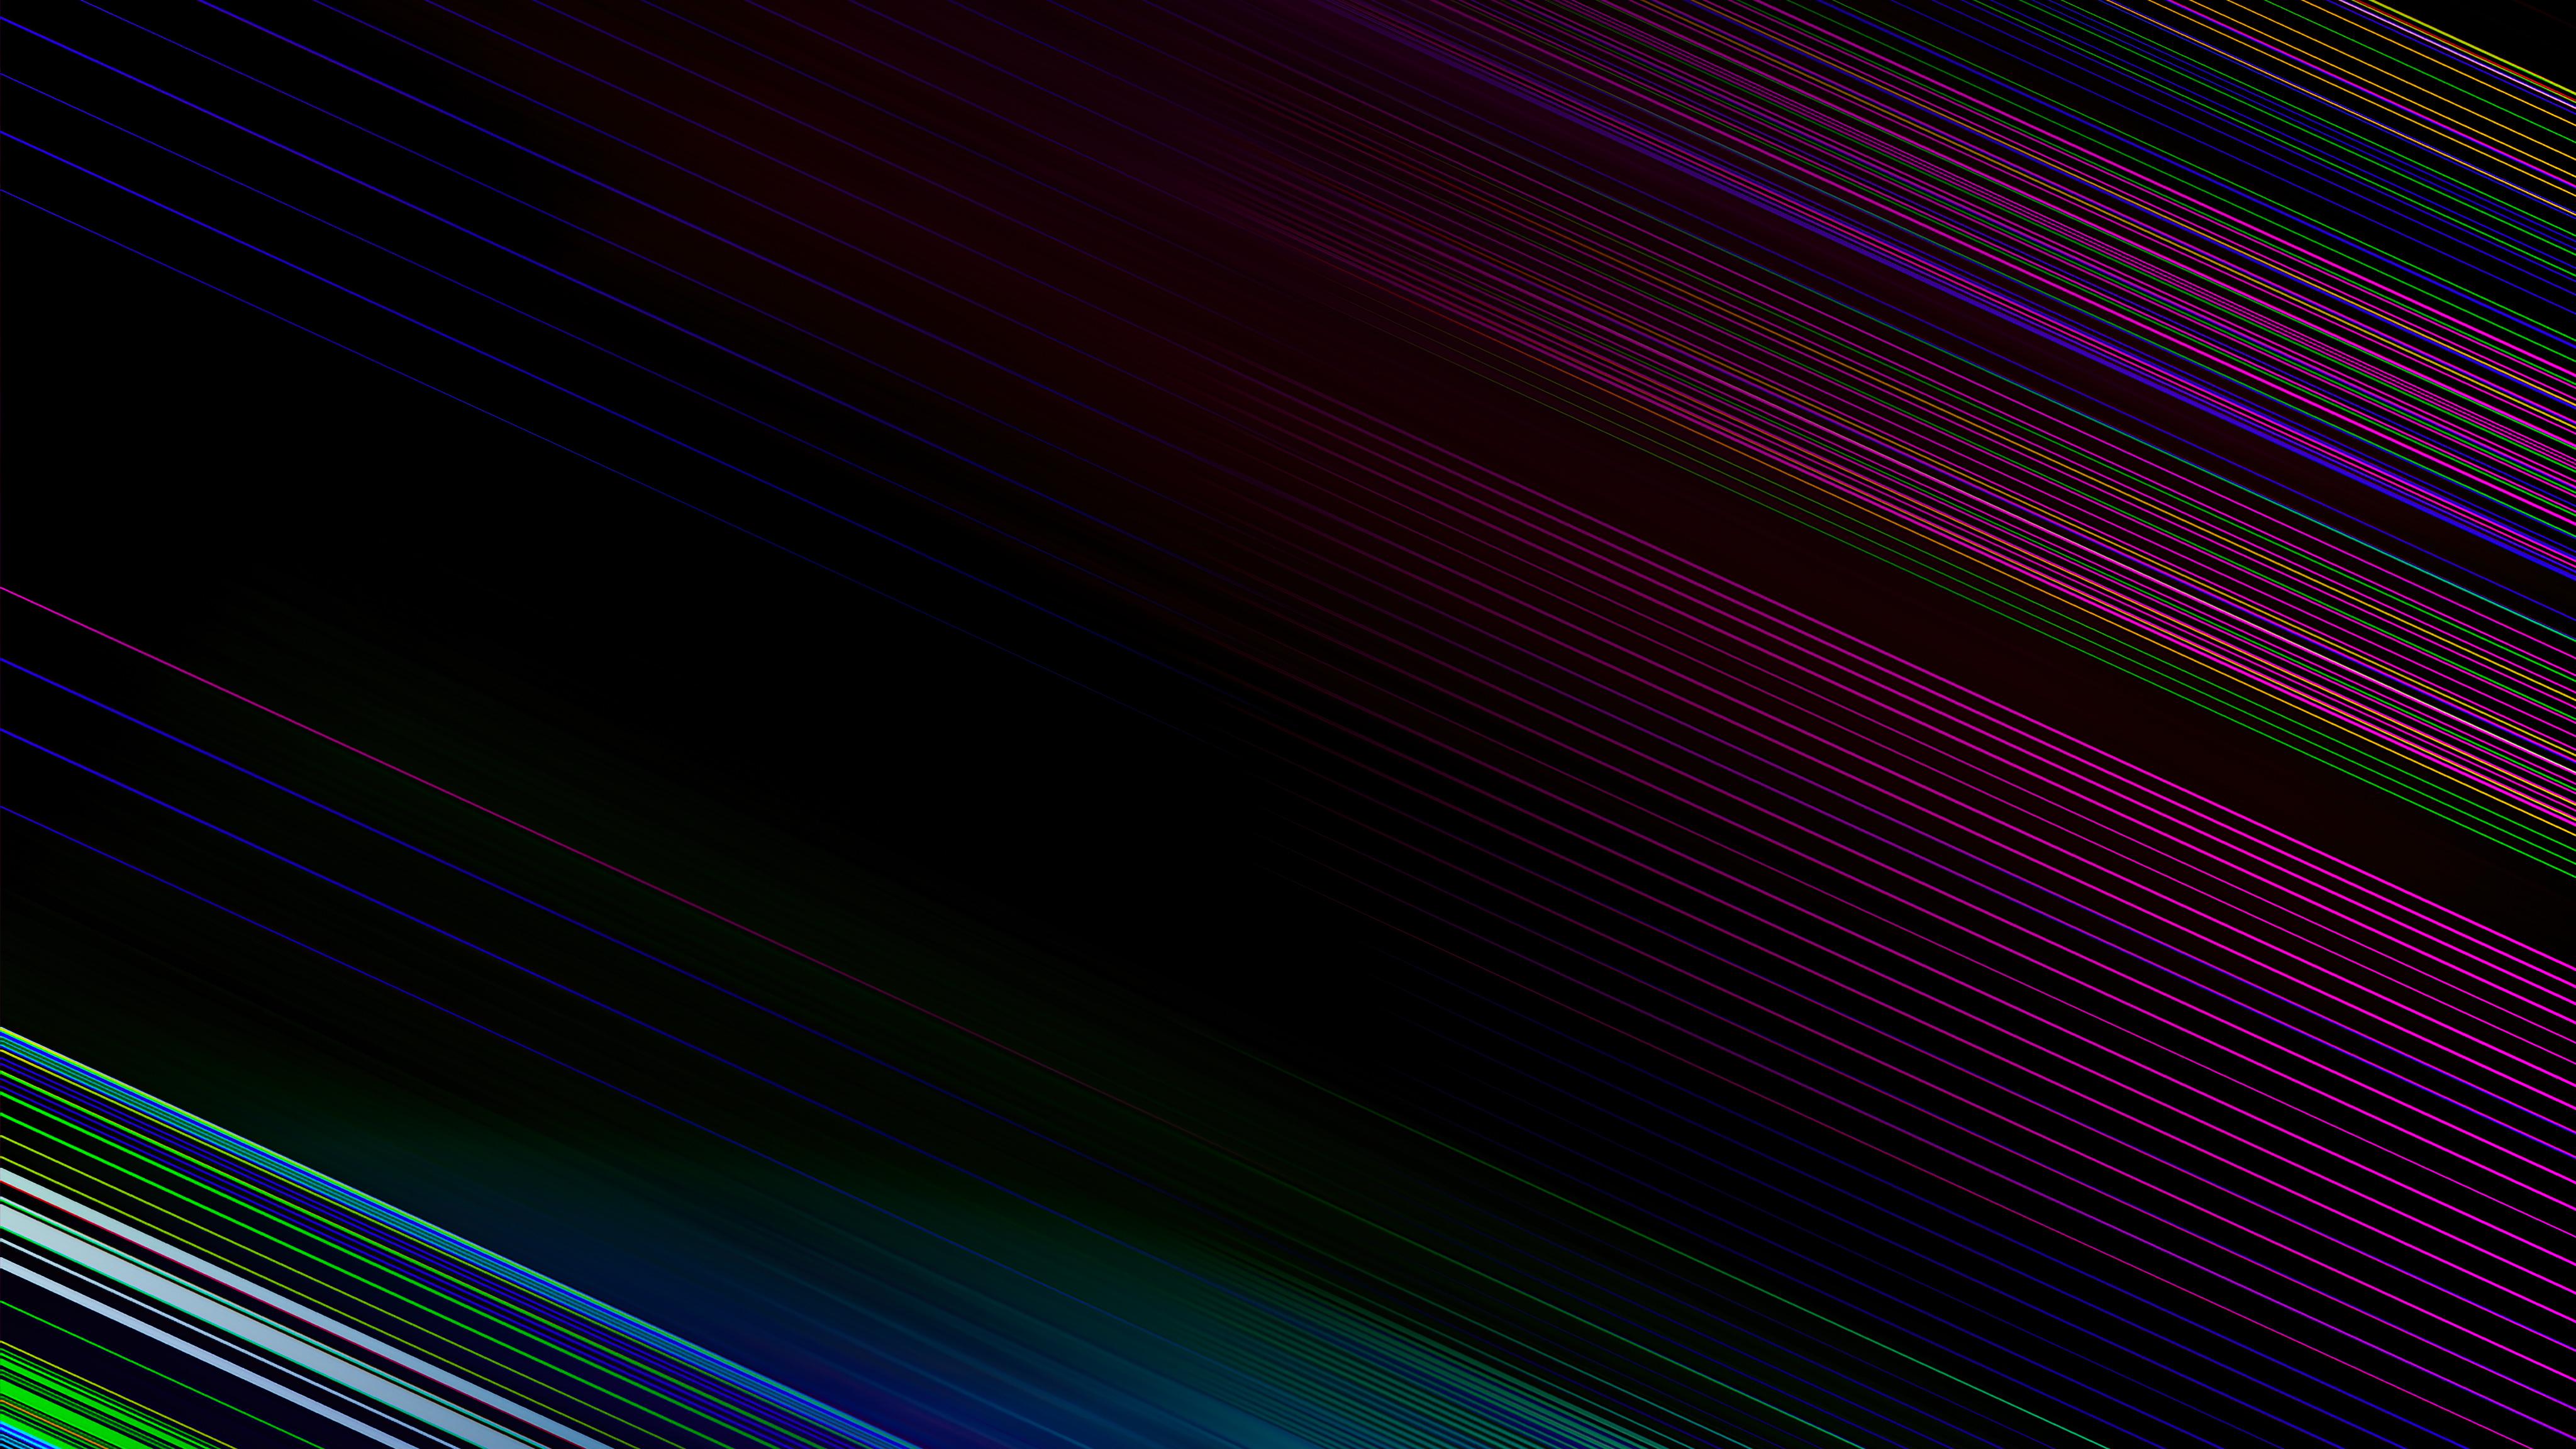 fiber lines abstract 4k 1620165330 - Fiber Lines Abstract 4k - Fiber Lines Abstract 4k wallpapers